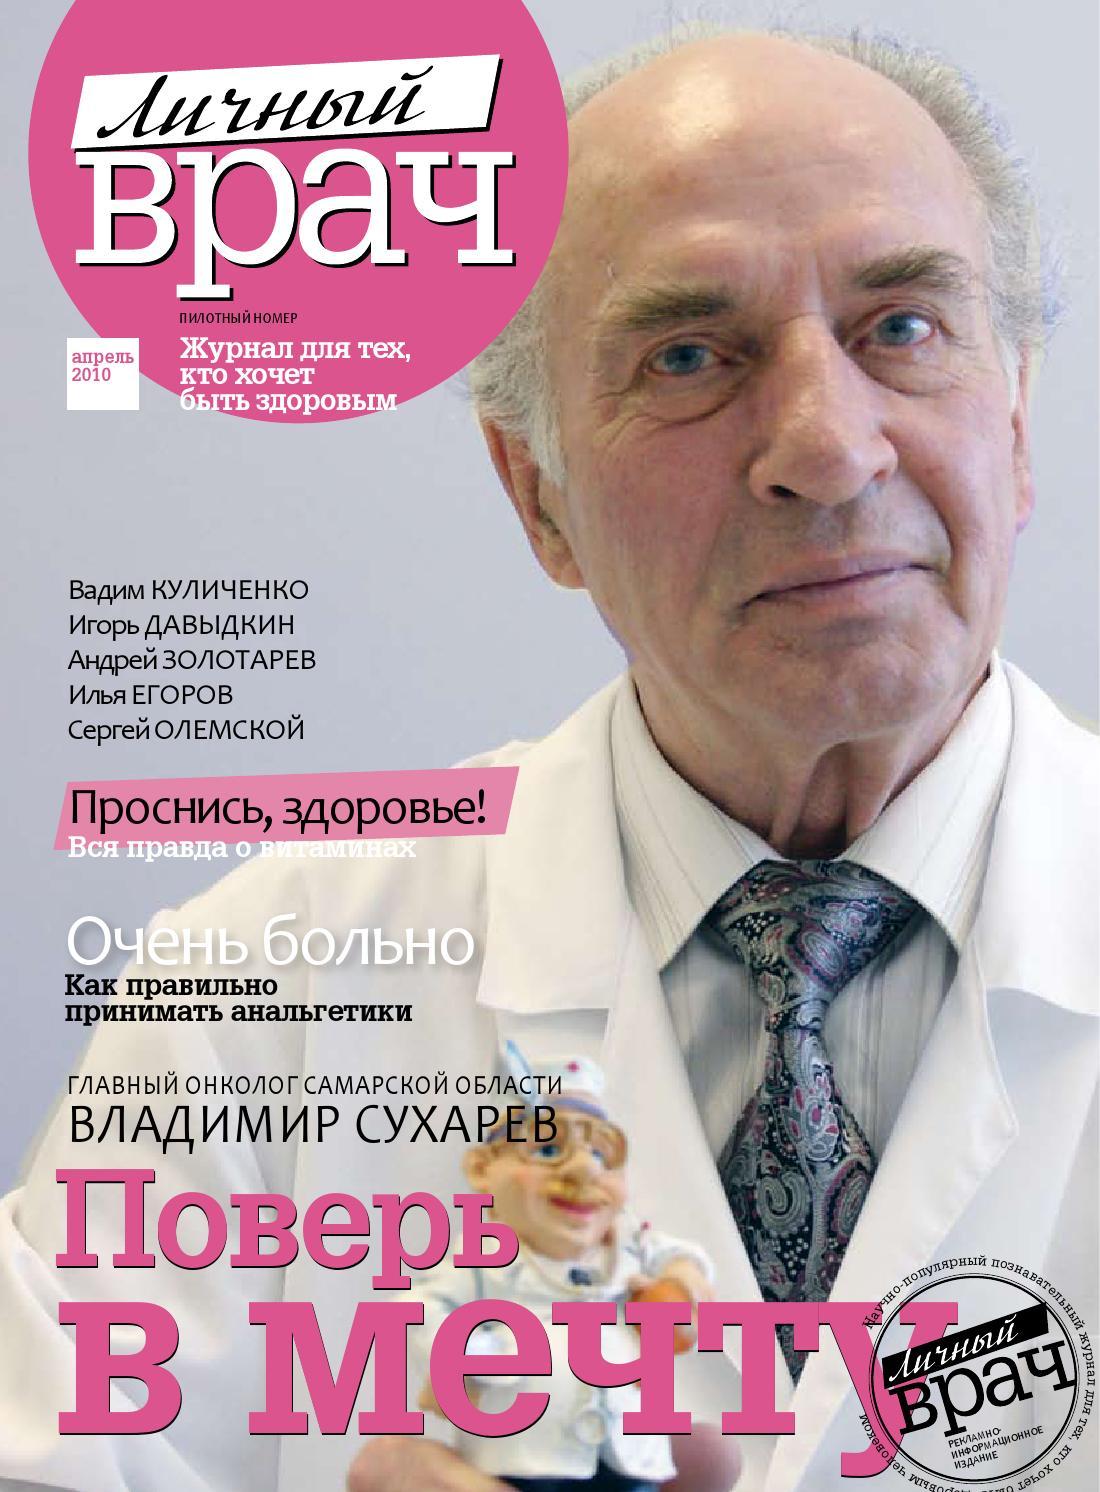 Личный врач 1 (2010) by LichnyiVrach - issuu